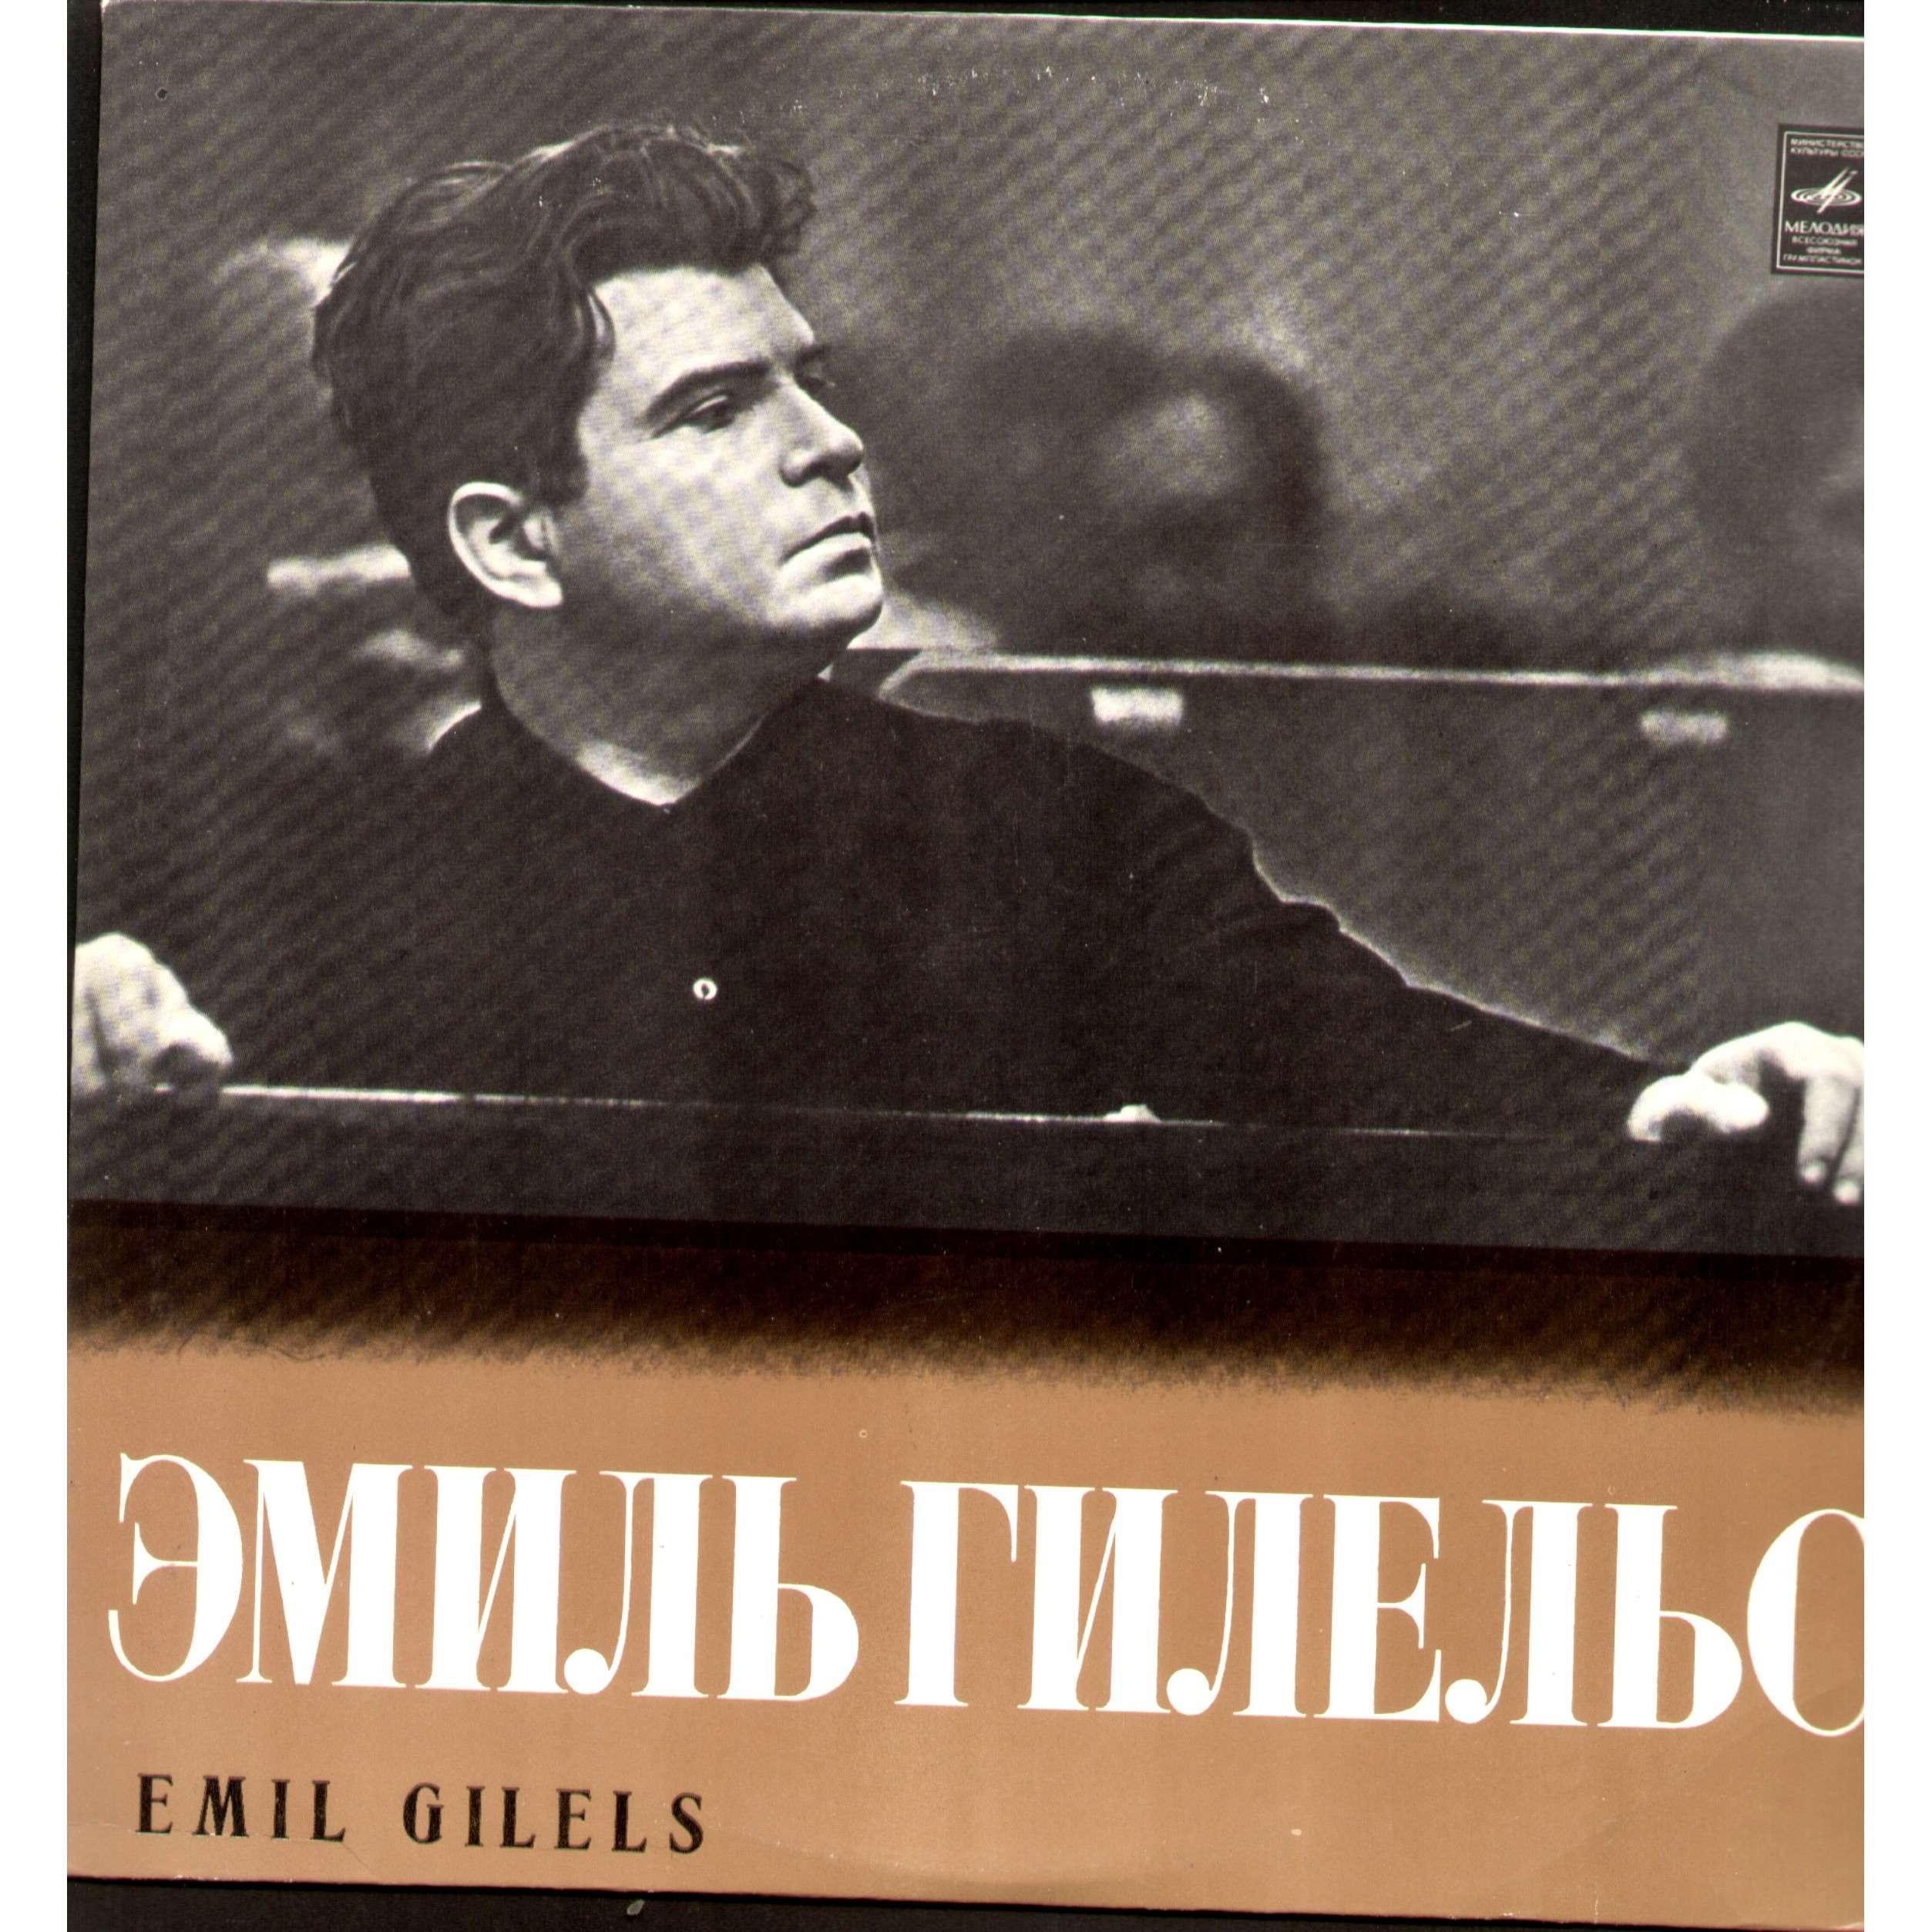 Emil Gilels Beethoven Sonatas No 6 Amp 23 Lp For Sale On